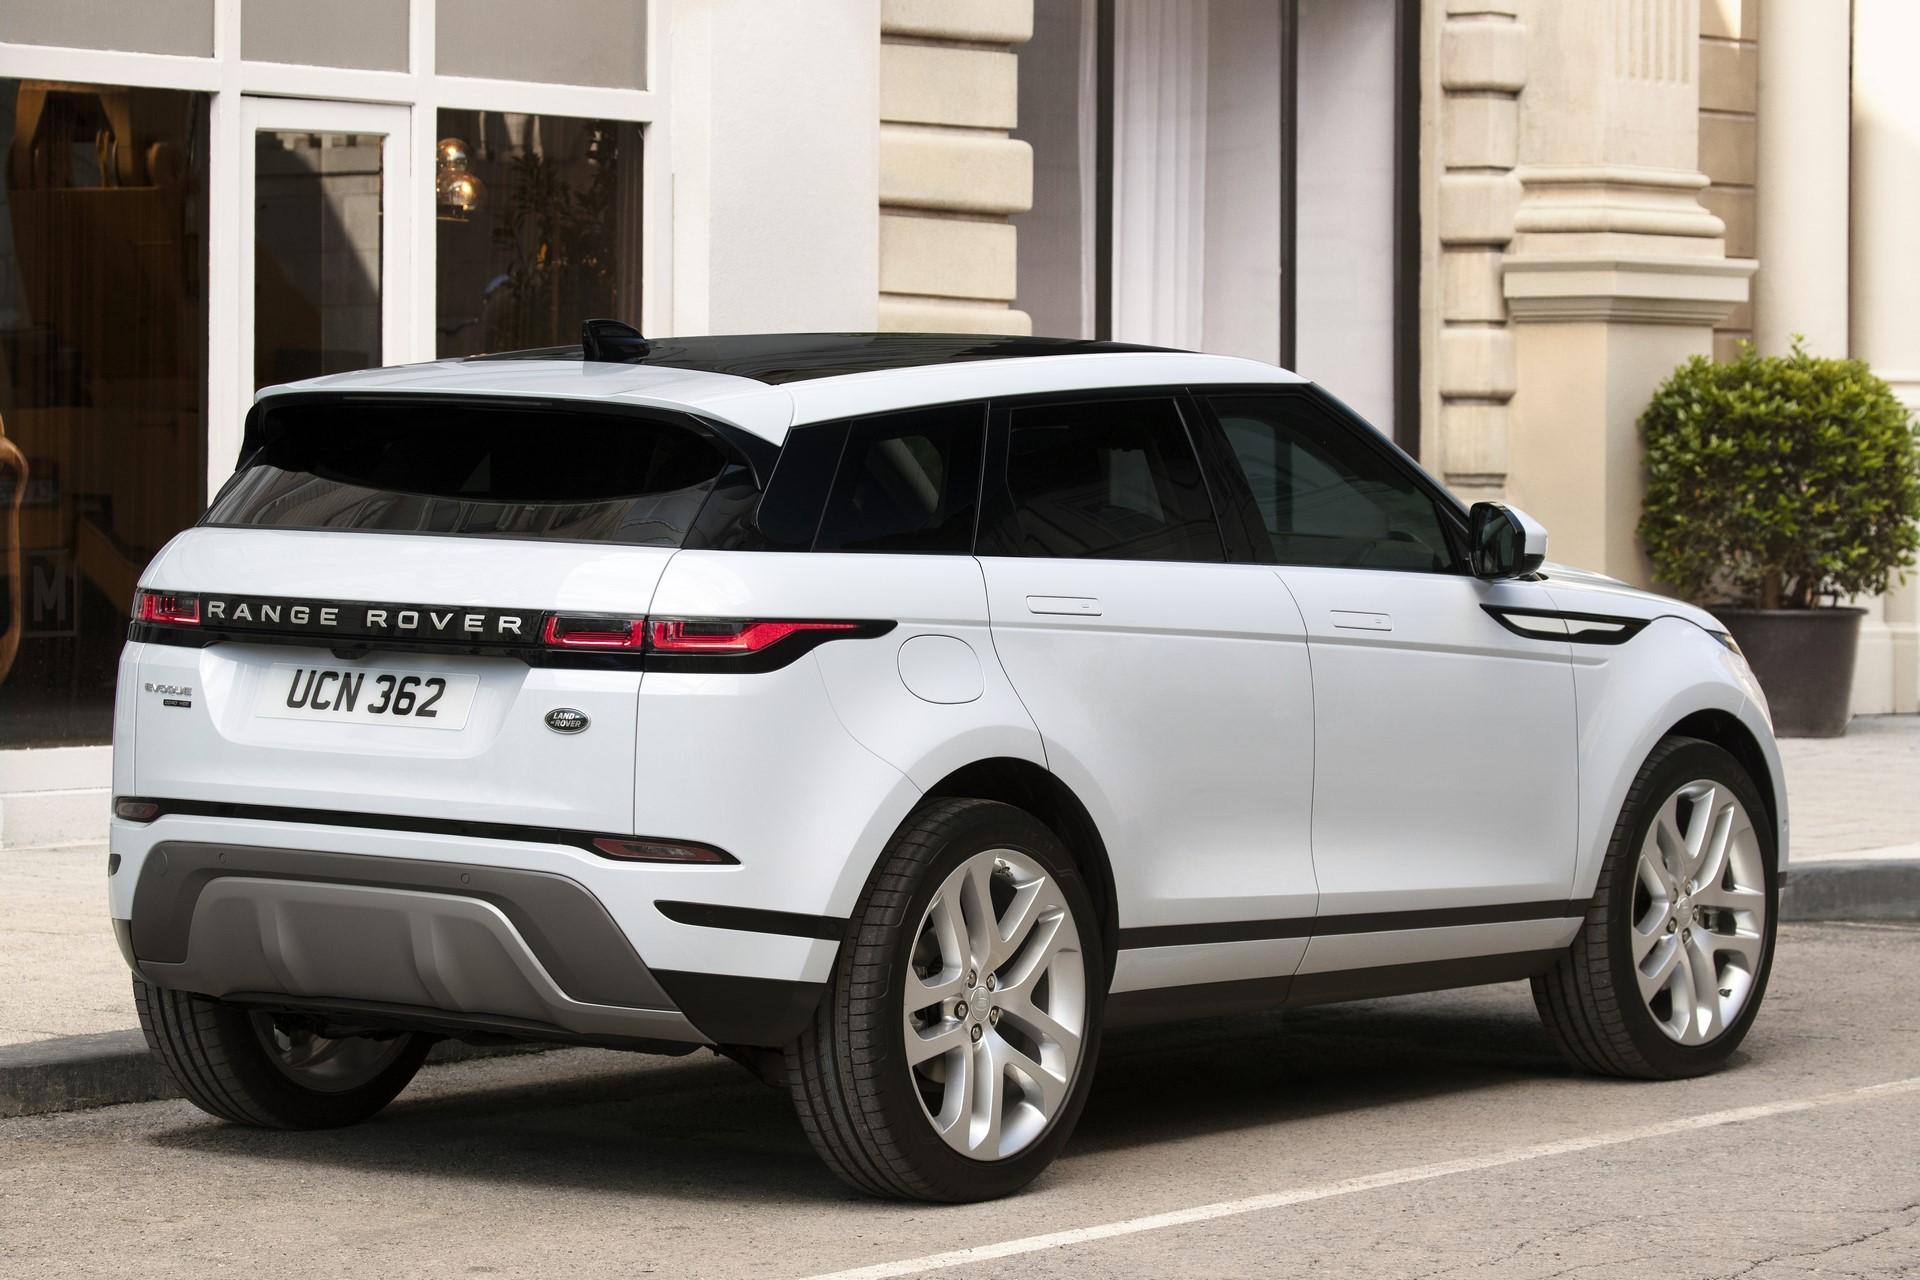 Range Rover Evoque 2019 (143)